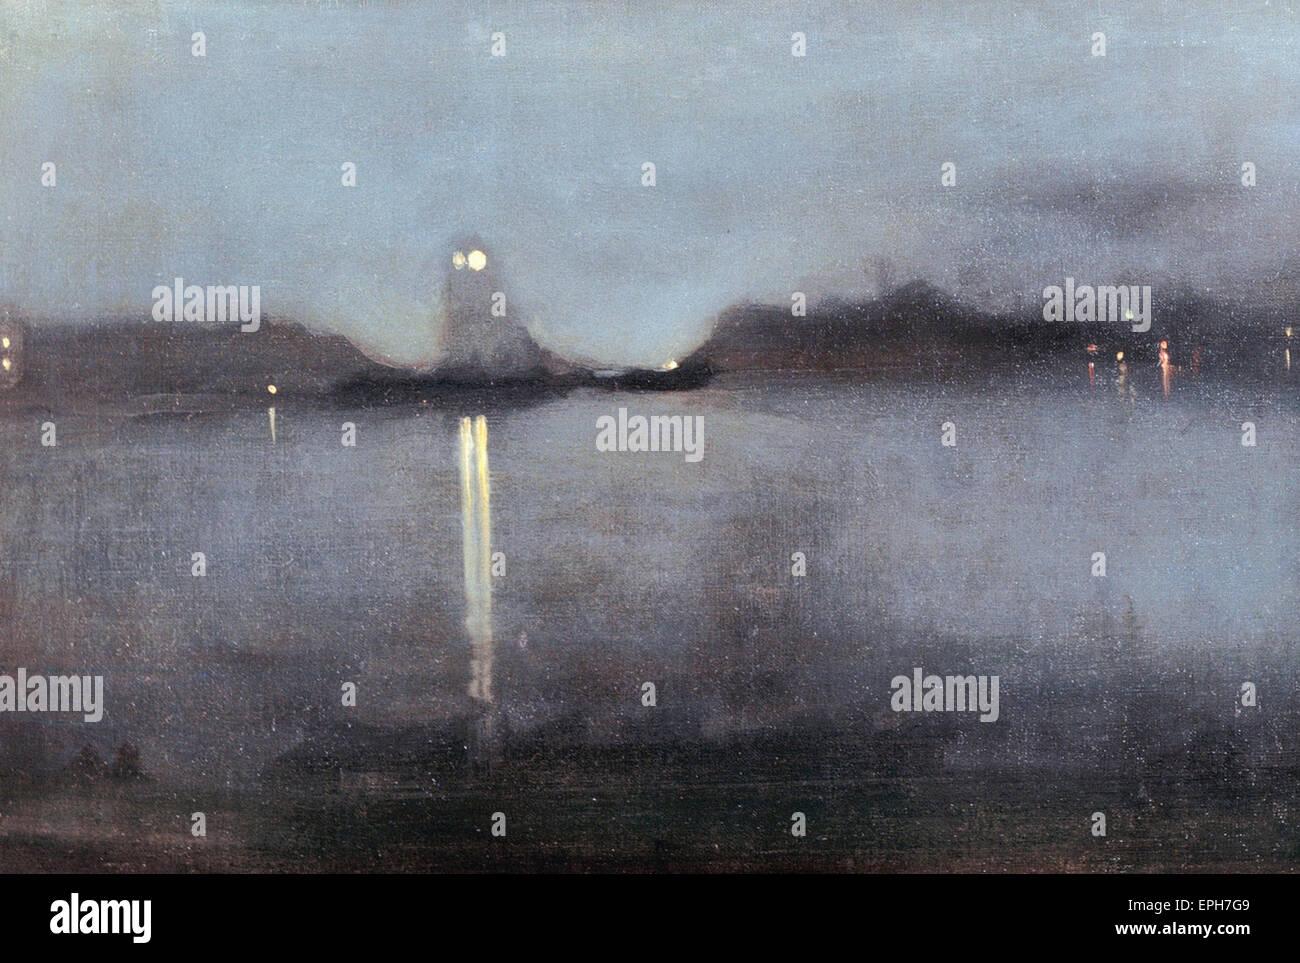 James Abbott McNeill Whistler  Nocturne - Stock Image